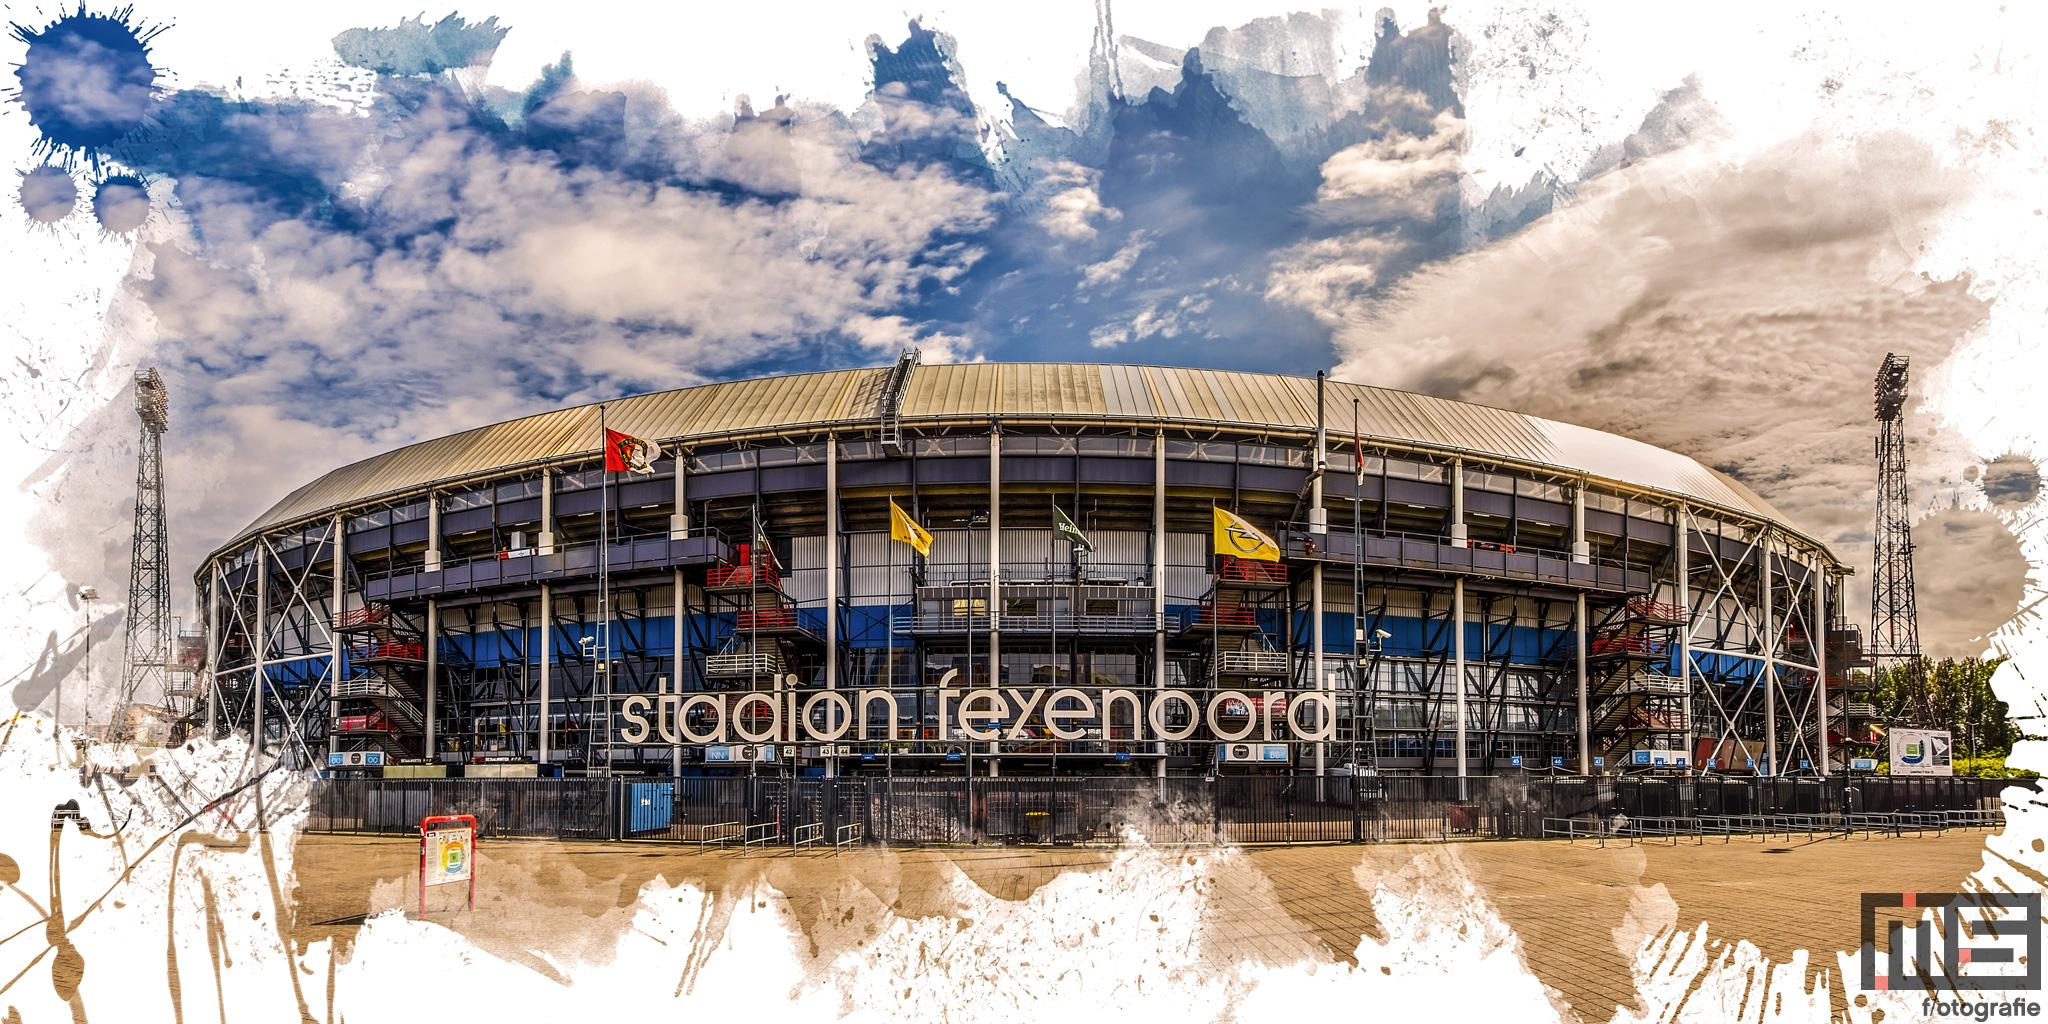 Te Koop   Het Feyenoord Art Stadion De Kuip in Rotterdam in kleur wit